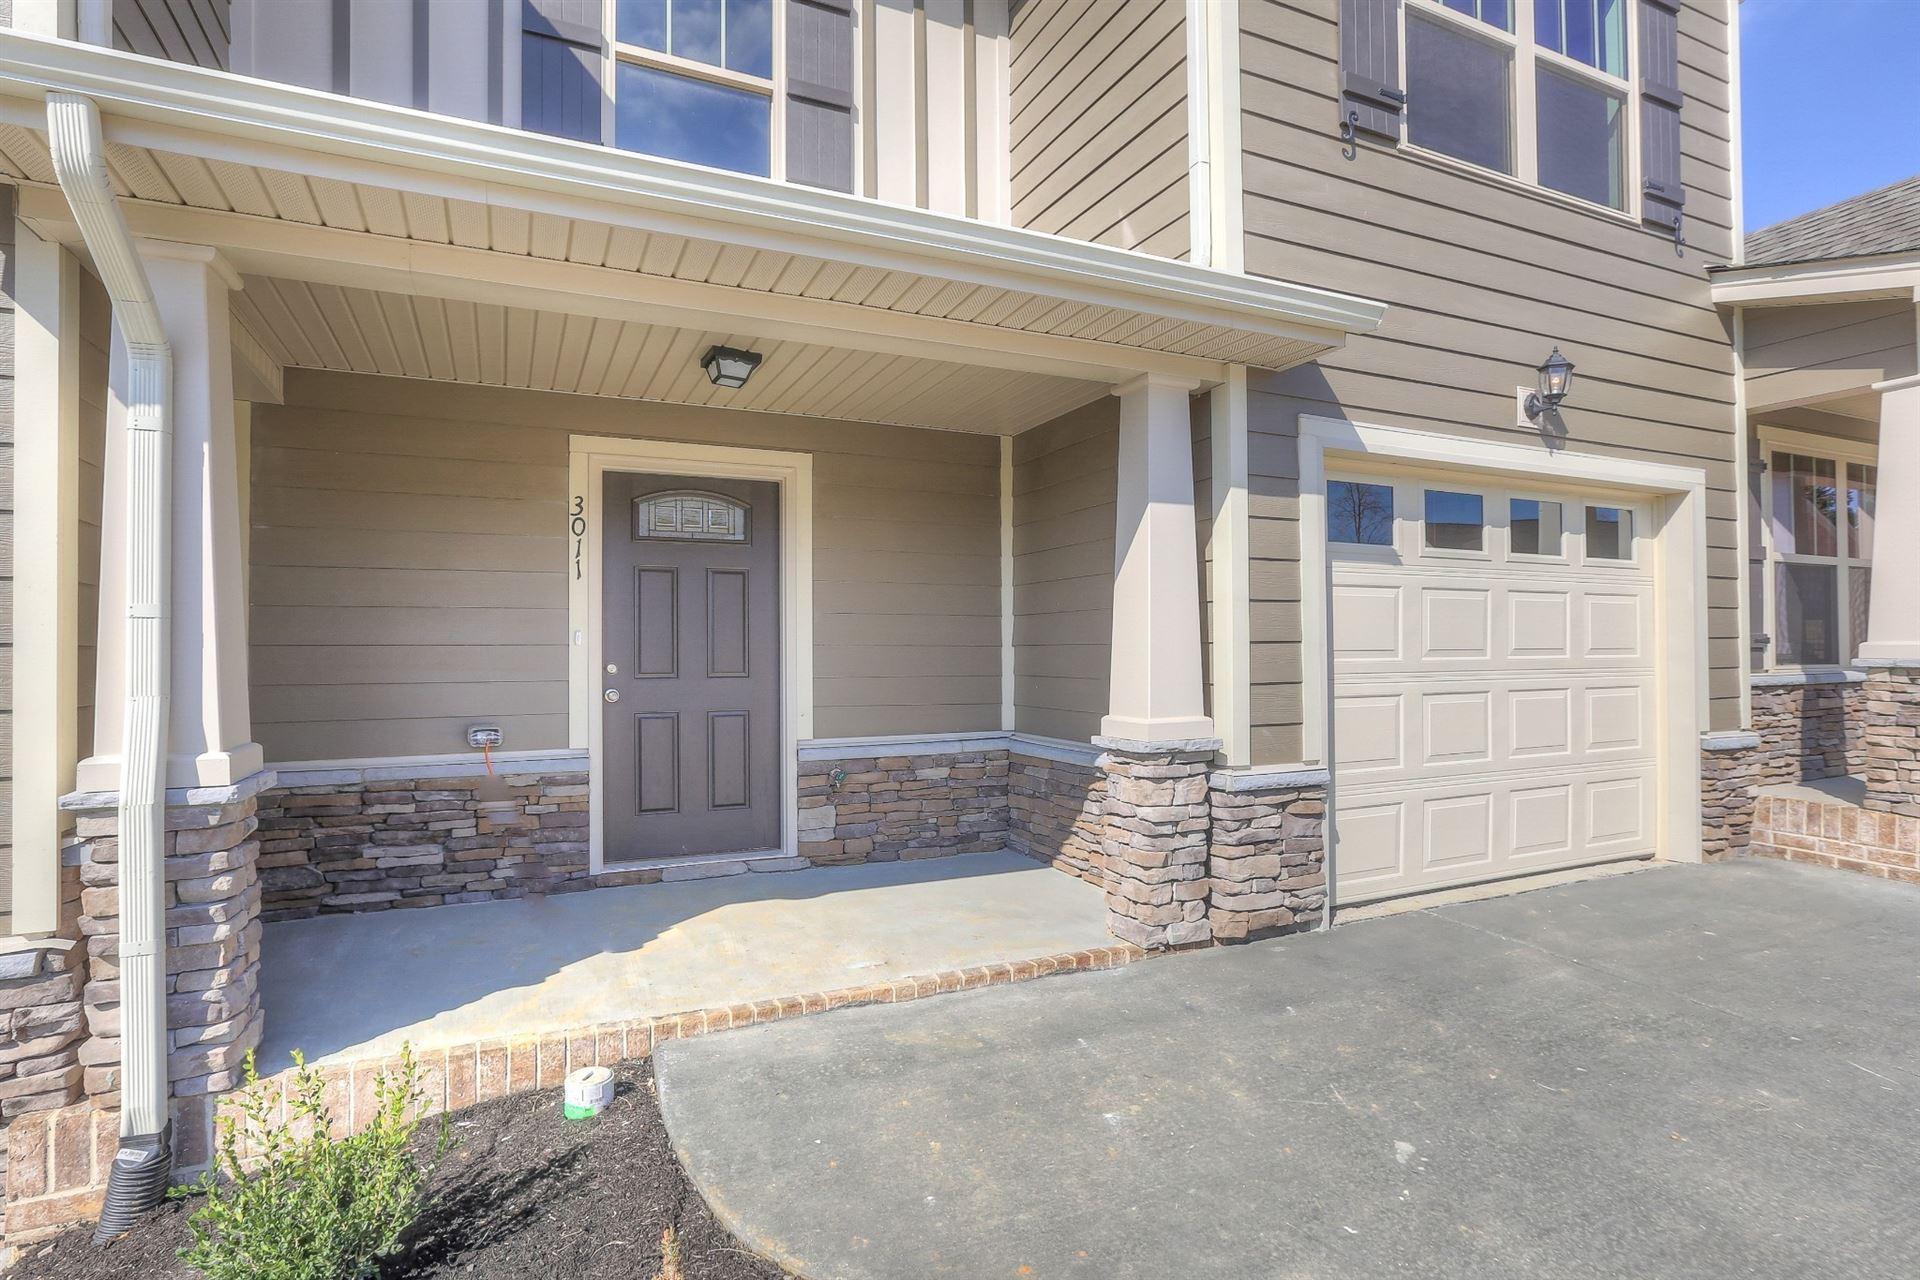 Photo of 317 Mattie Lane Lot 38, Spring Hill, TN 37174 (MLS # 2200097)